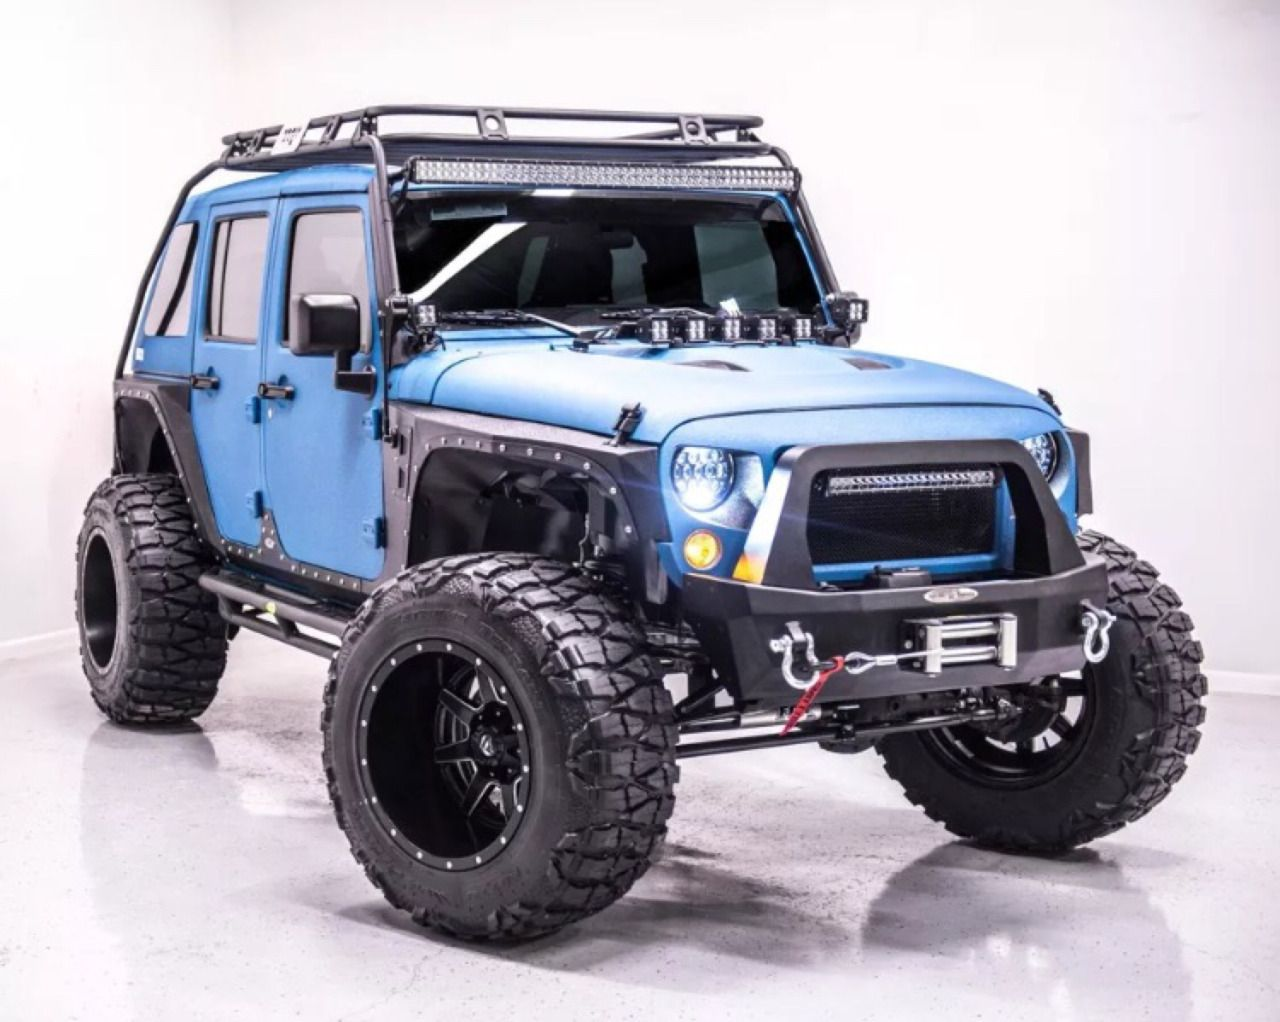 Jeep Life 2016 jeep wrangler, Wrangler unlimited sport